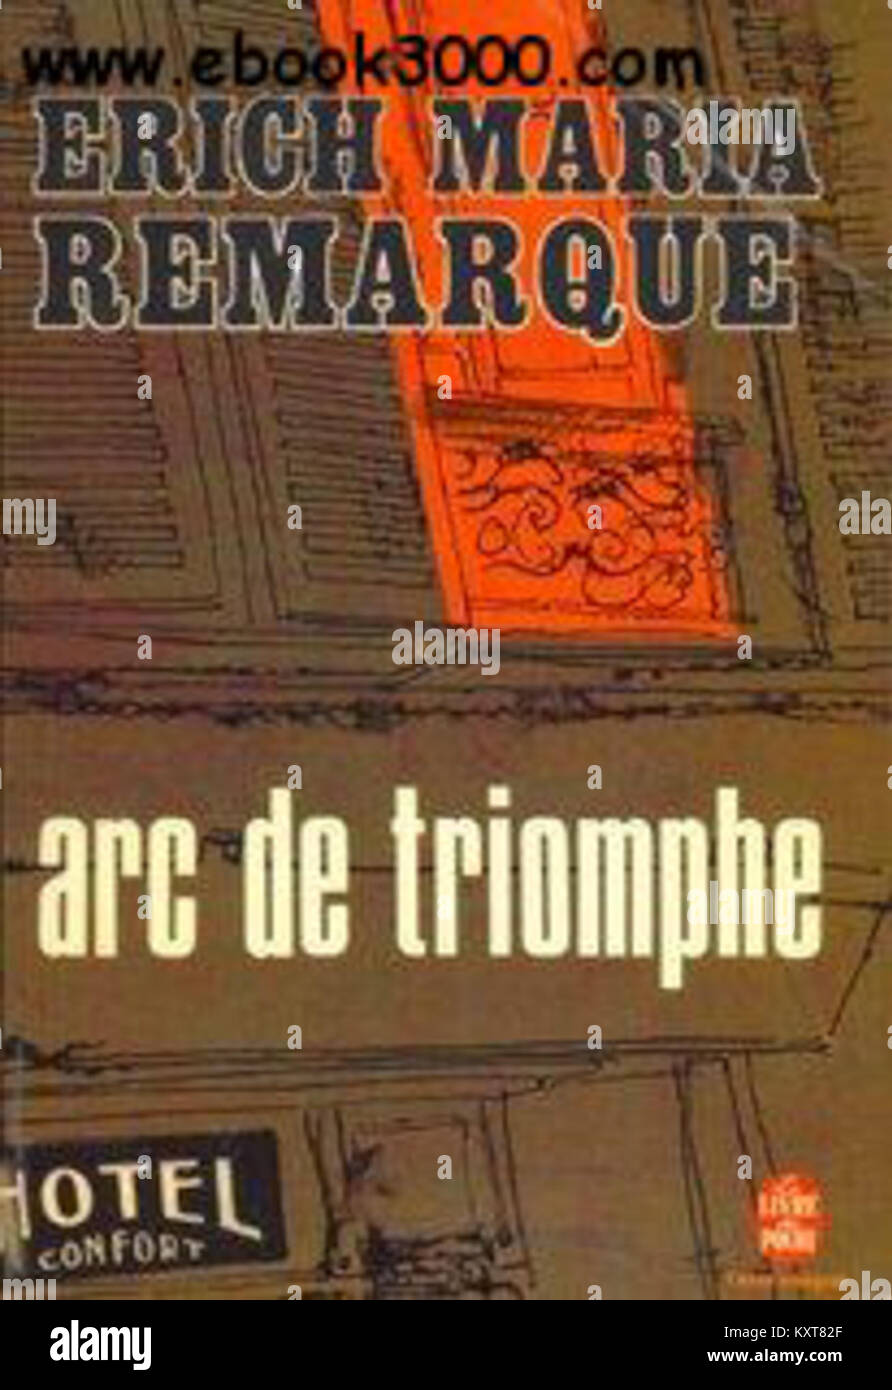 Erich Maria Remarque, Arc de Triomphe: a summary 60